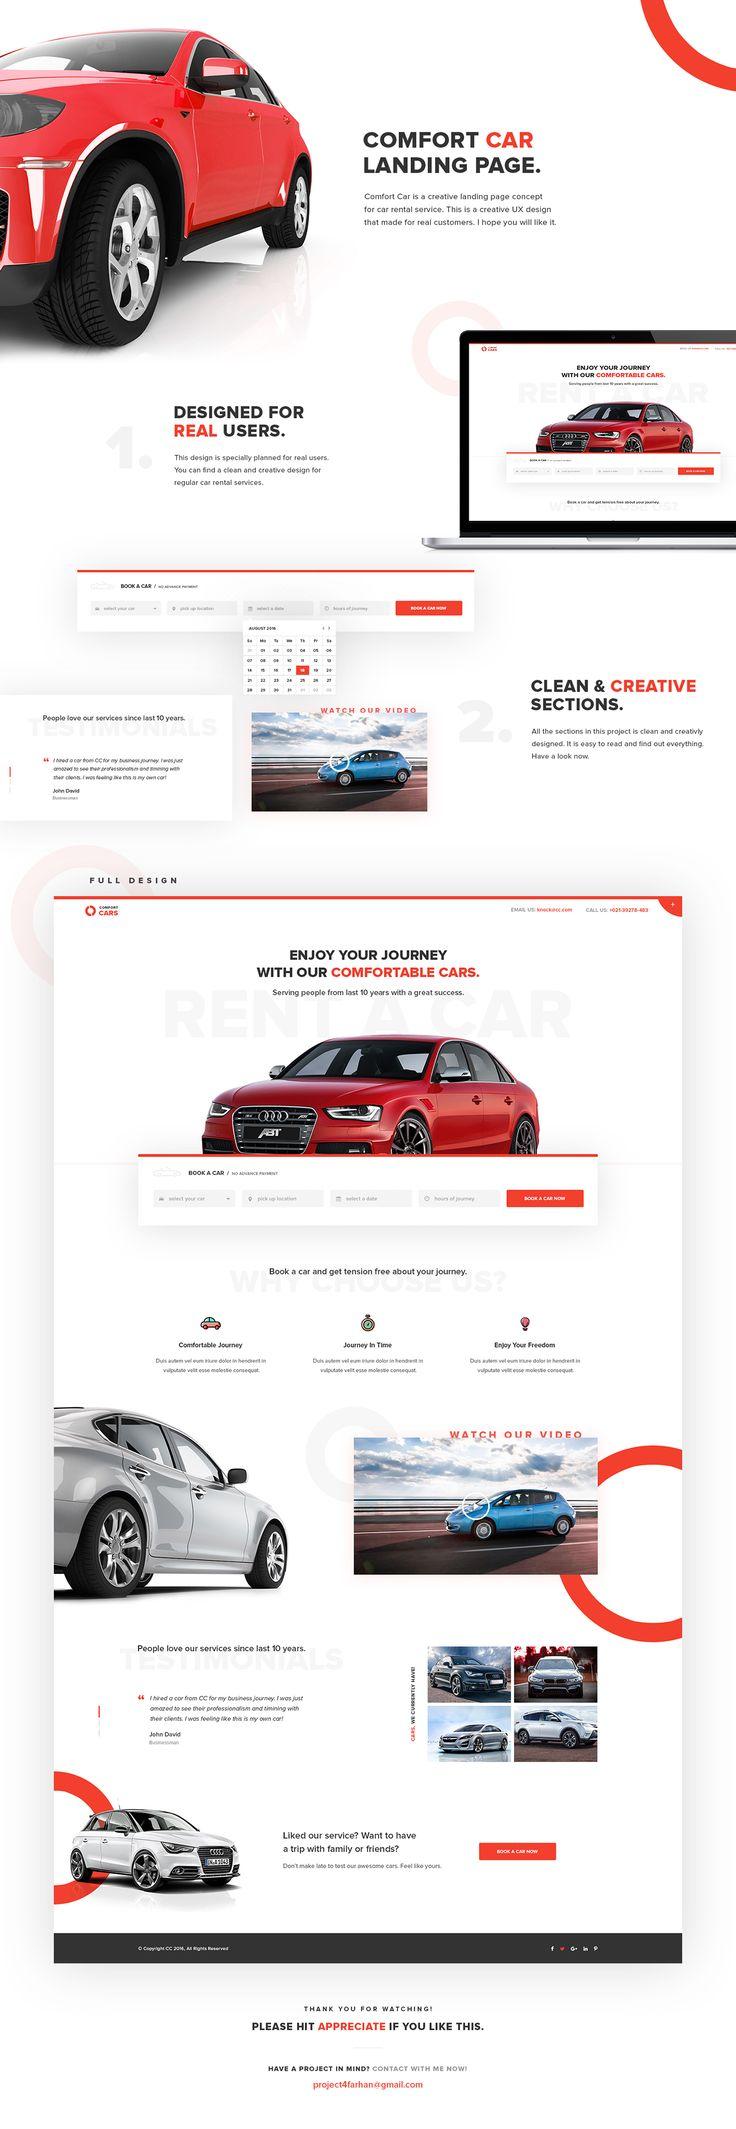 Car rental landing page concept on behance